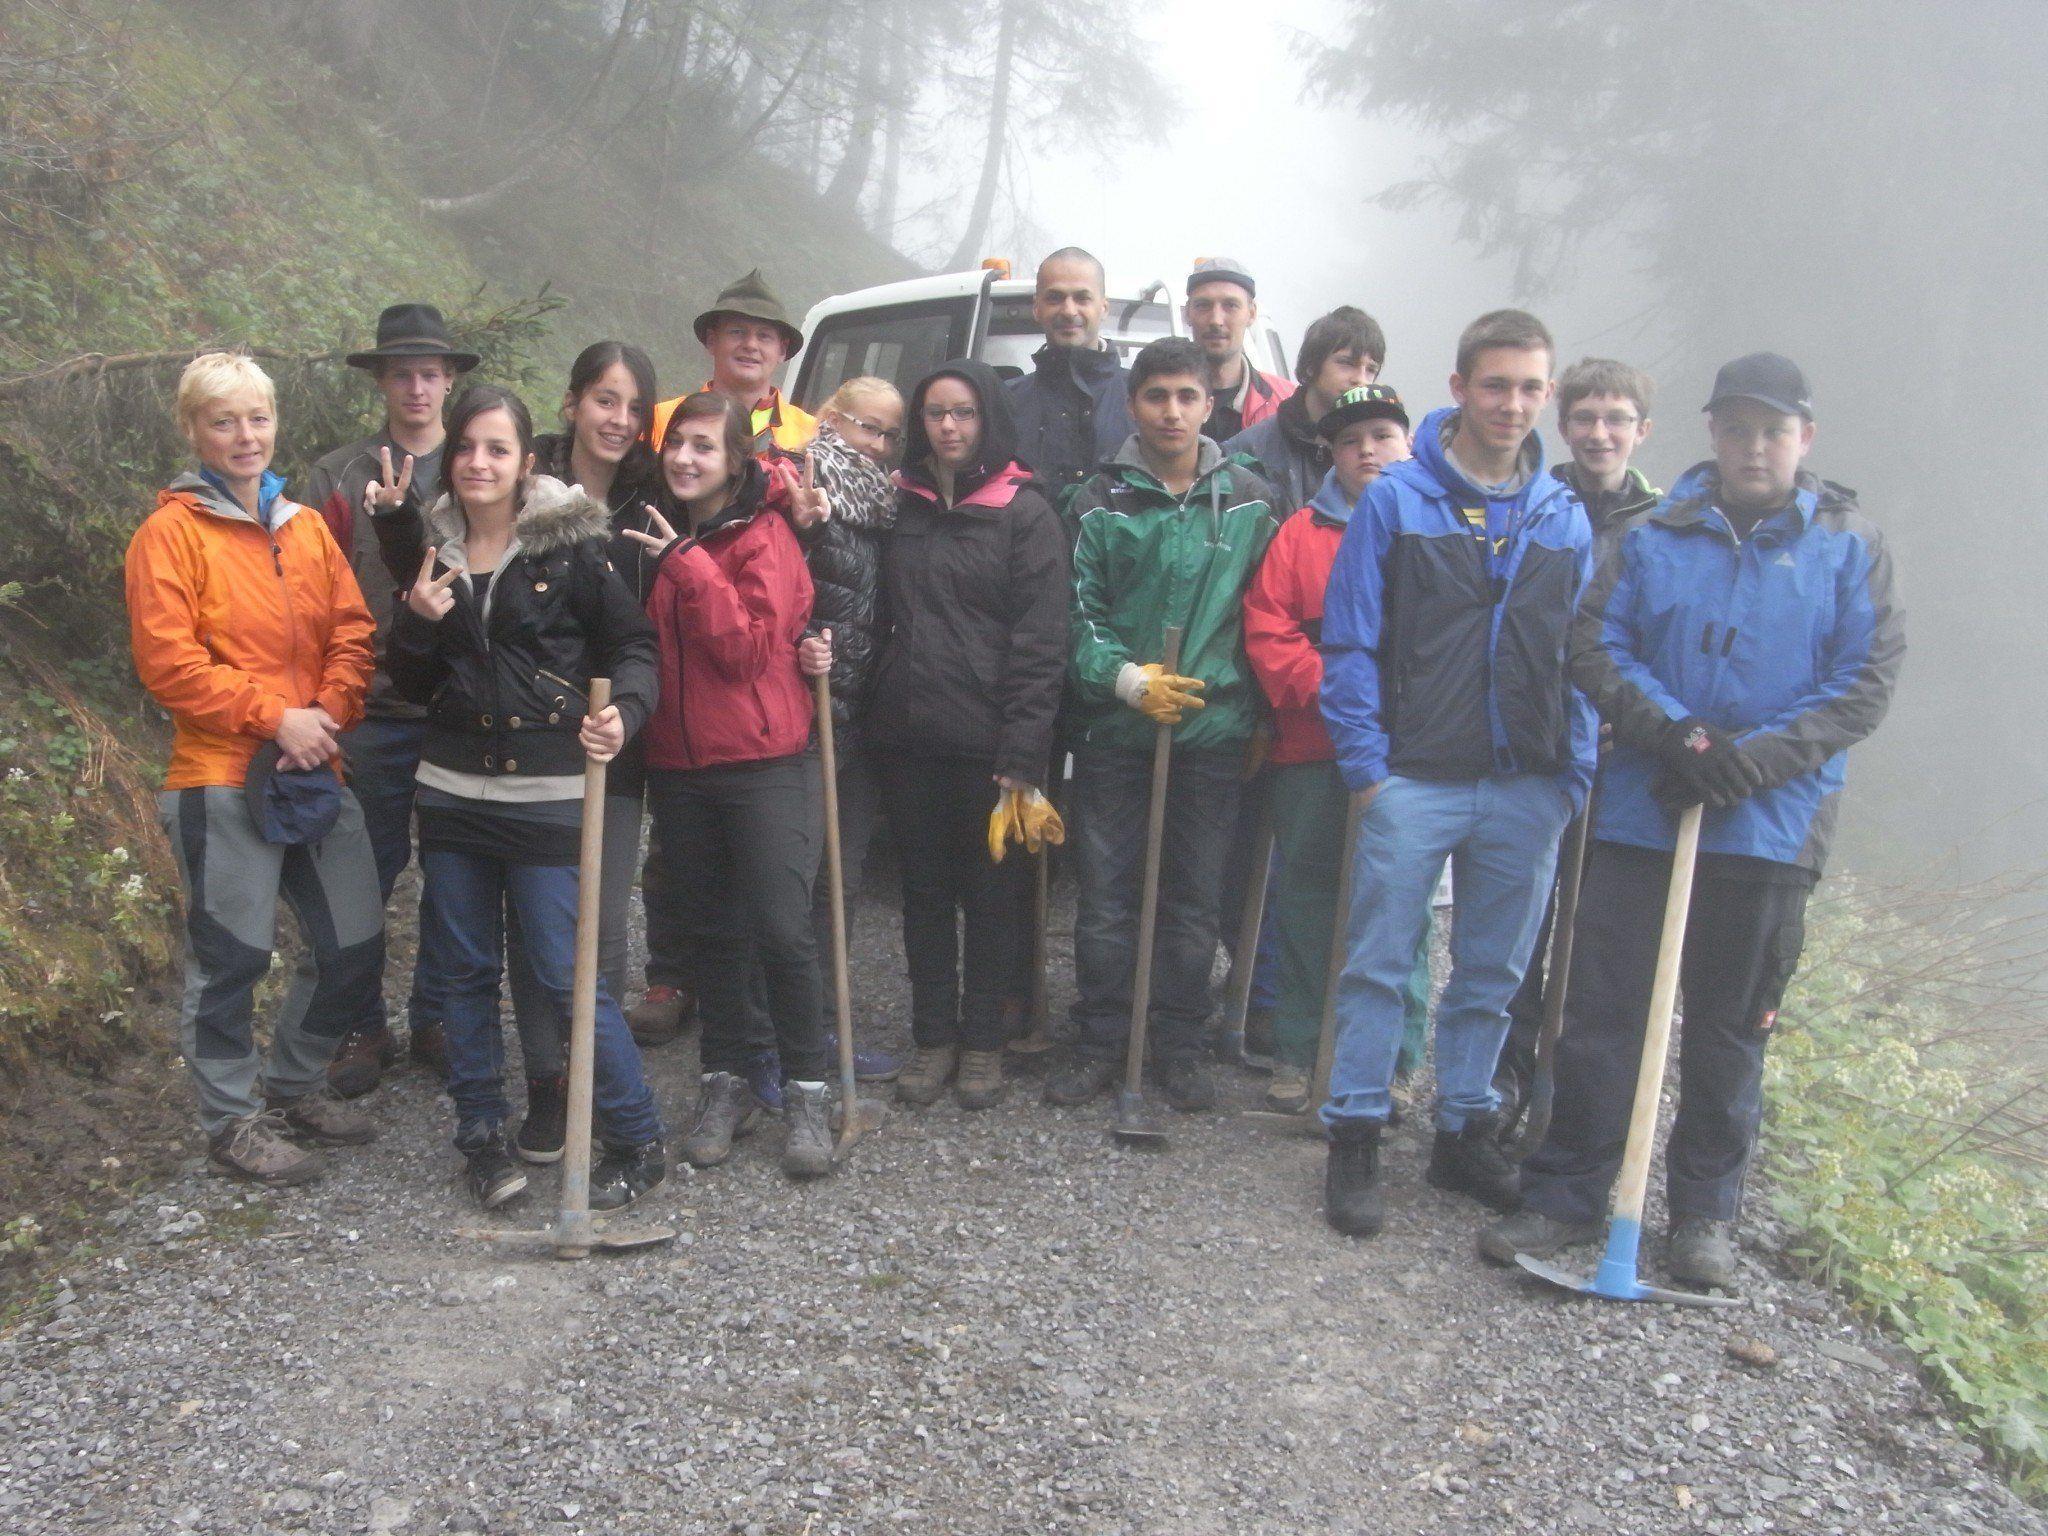 Setzten Forstpflanzen im Bereich Tschöppa und Schandang - die Schüler des HPSZ Montafon.